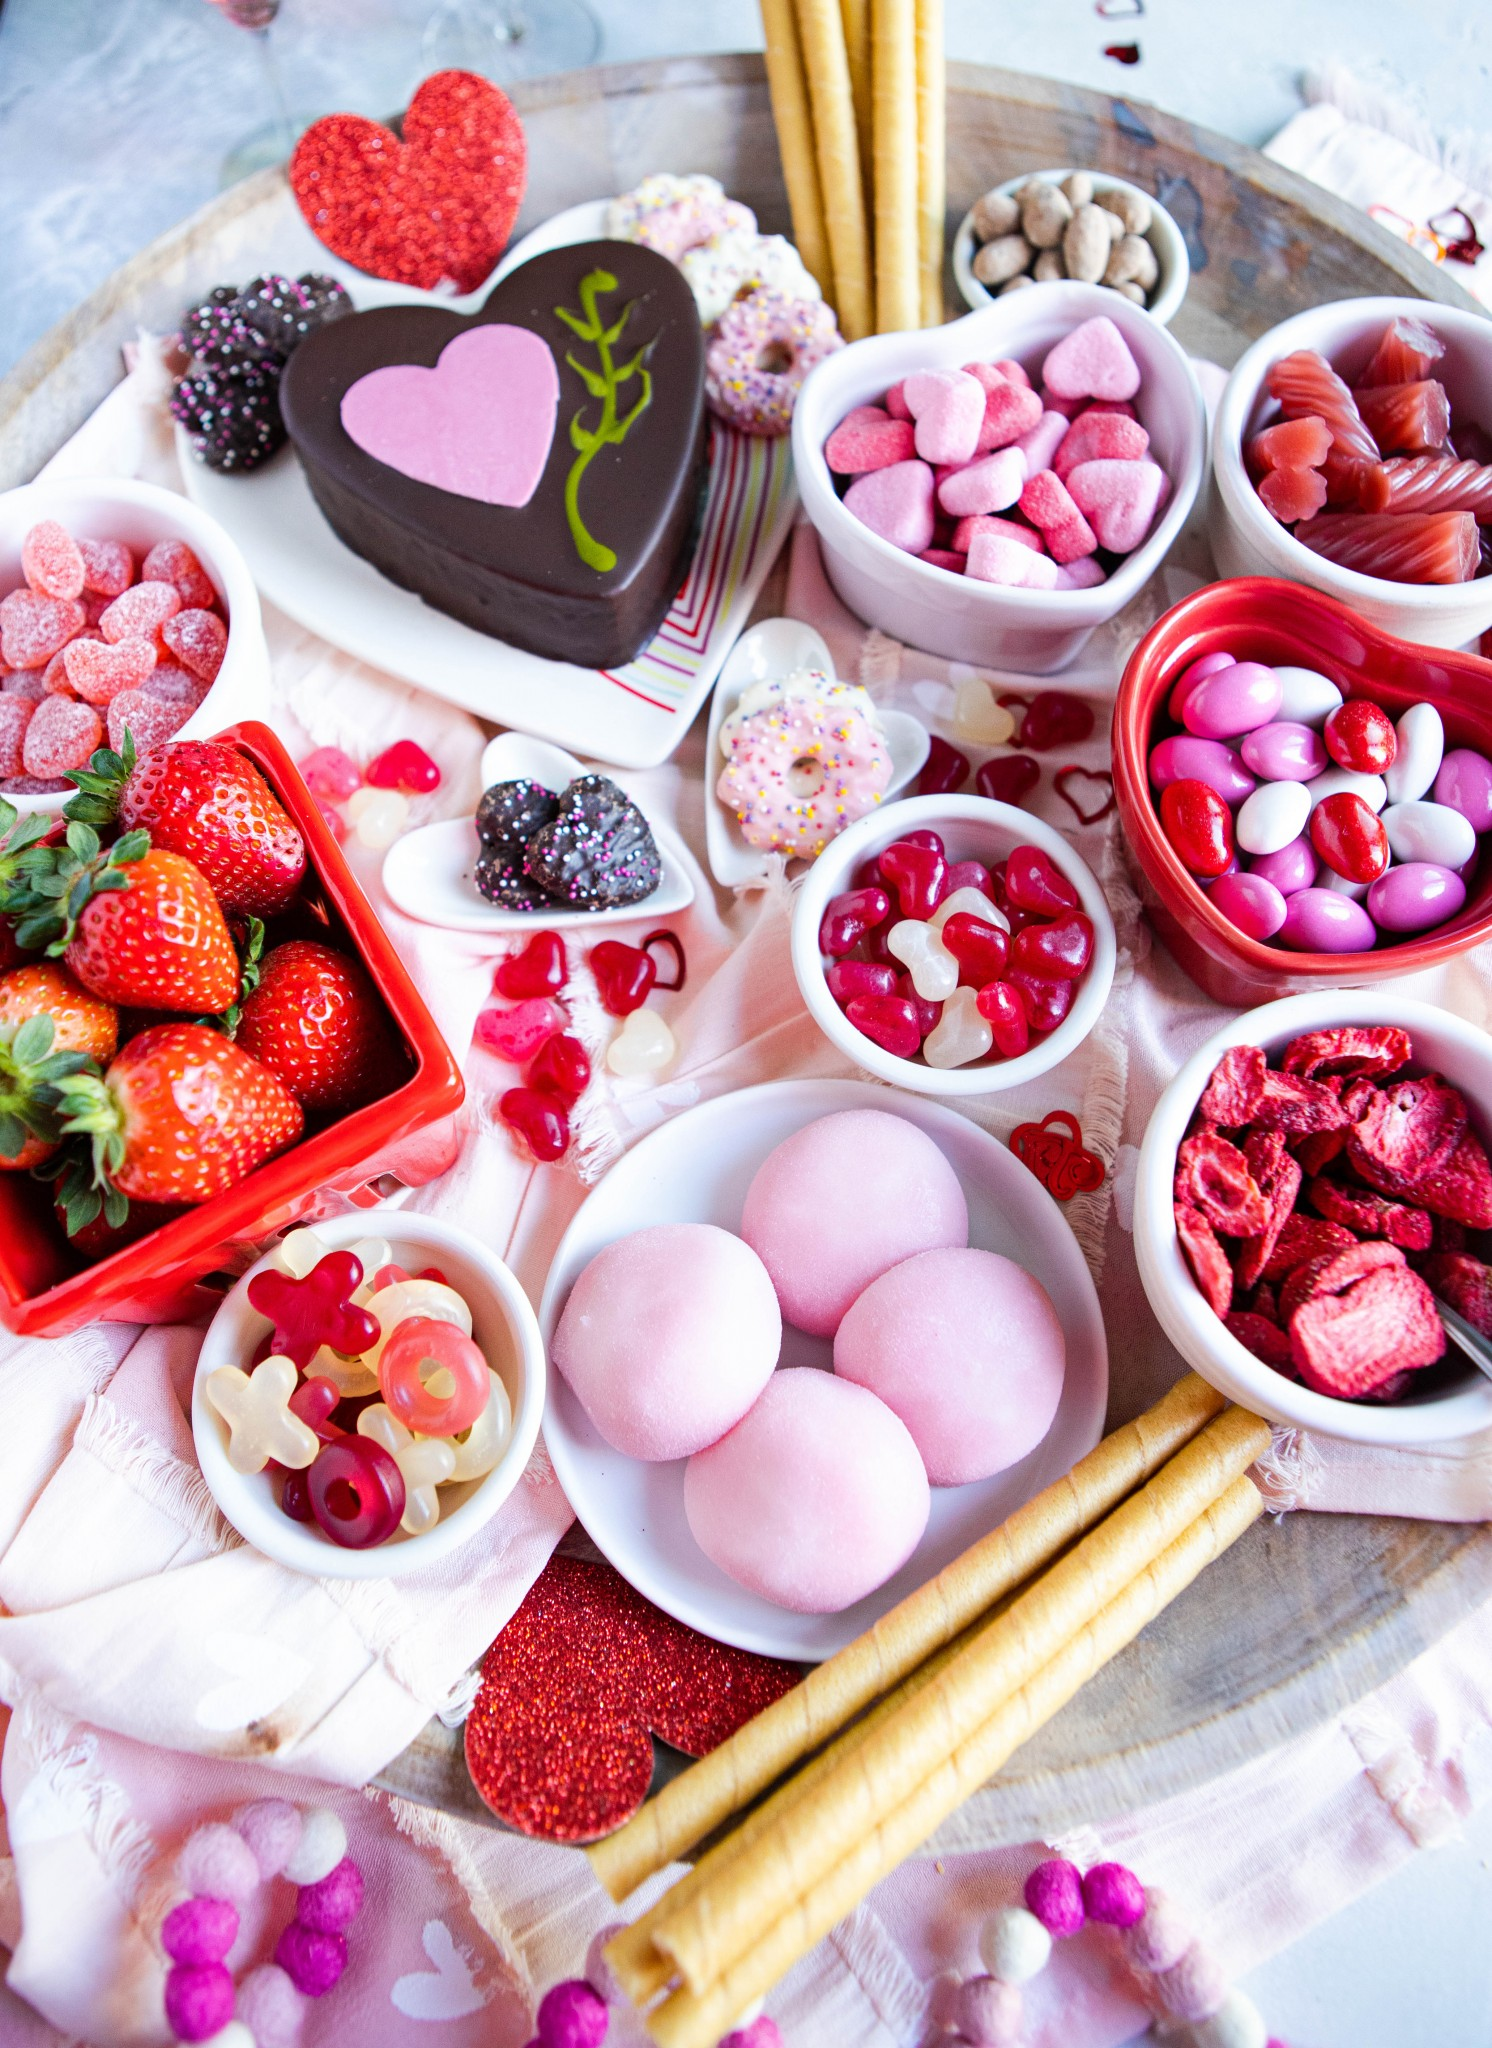 Valentine's day themed dessert charcuterie board